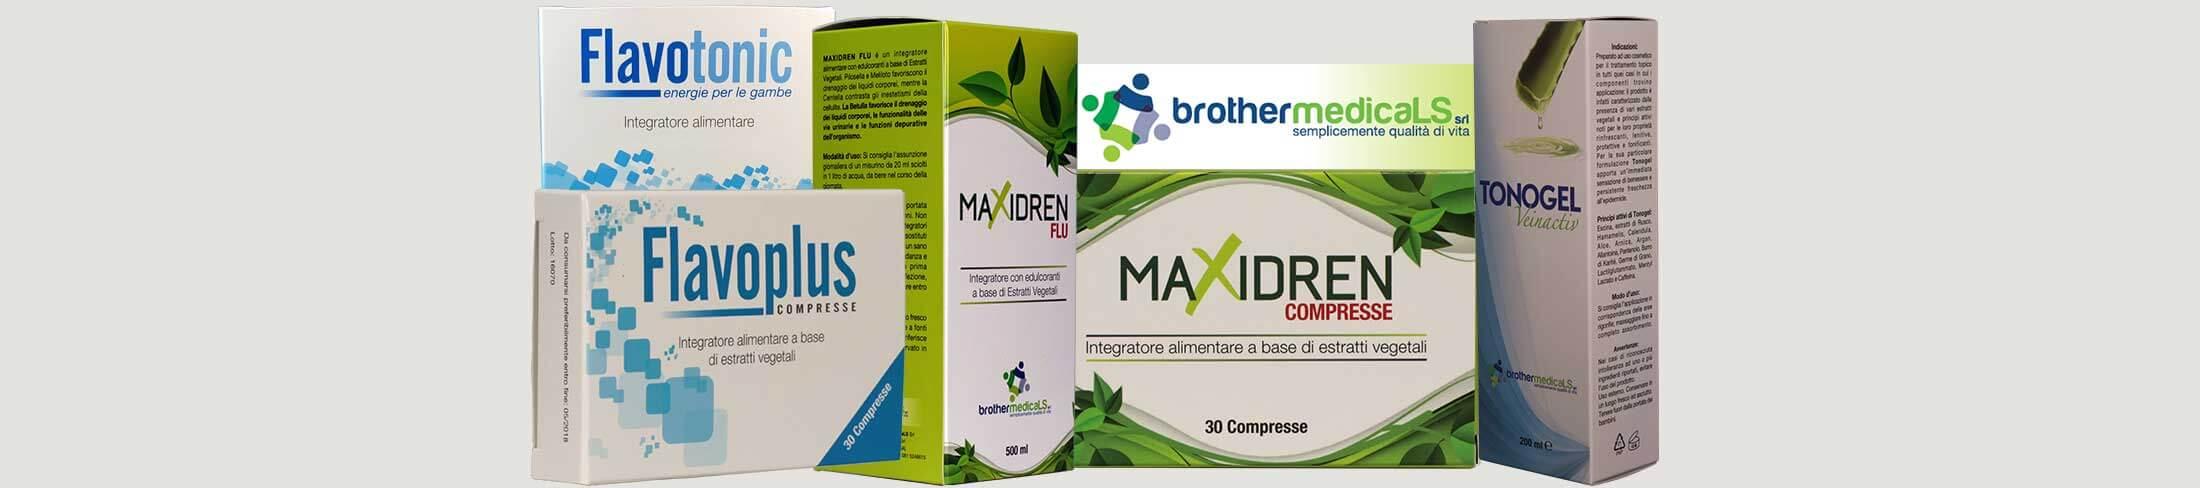 BROTHERMEDICALS SRL: Flavotonic polvere solubile, Flavoplus compresse, Maxidren Flu e compresse e infine Tonogel Veinactiv